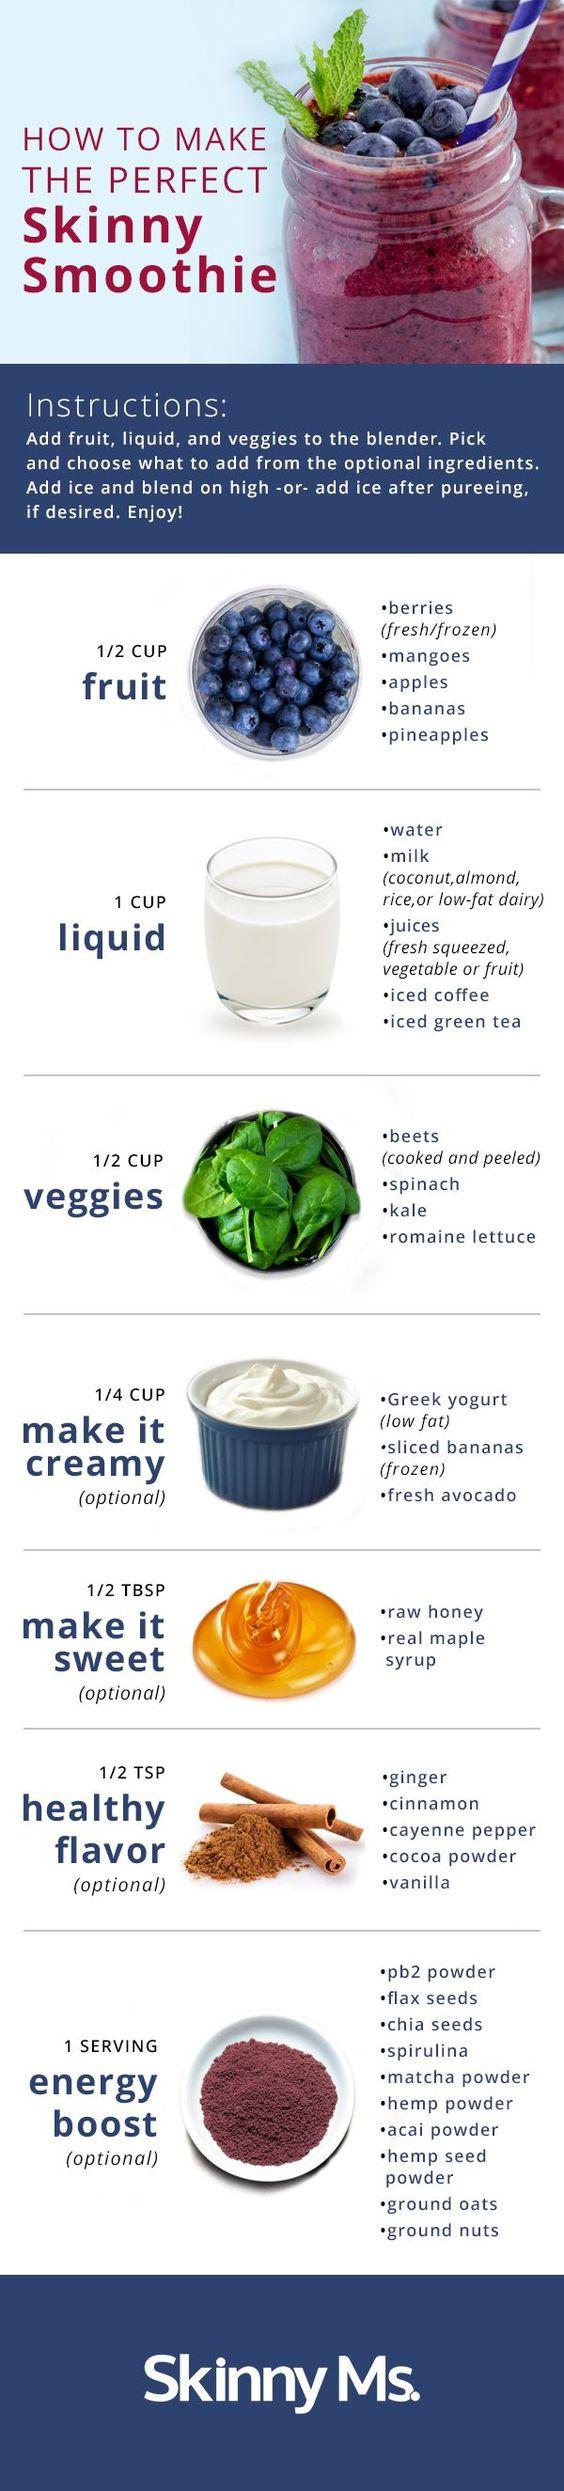 How to Make the Perfect Skinny Smoothie. #skinnysmoothie #blueberrysmoothie